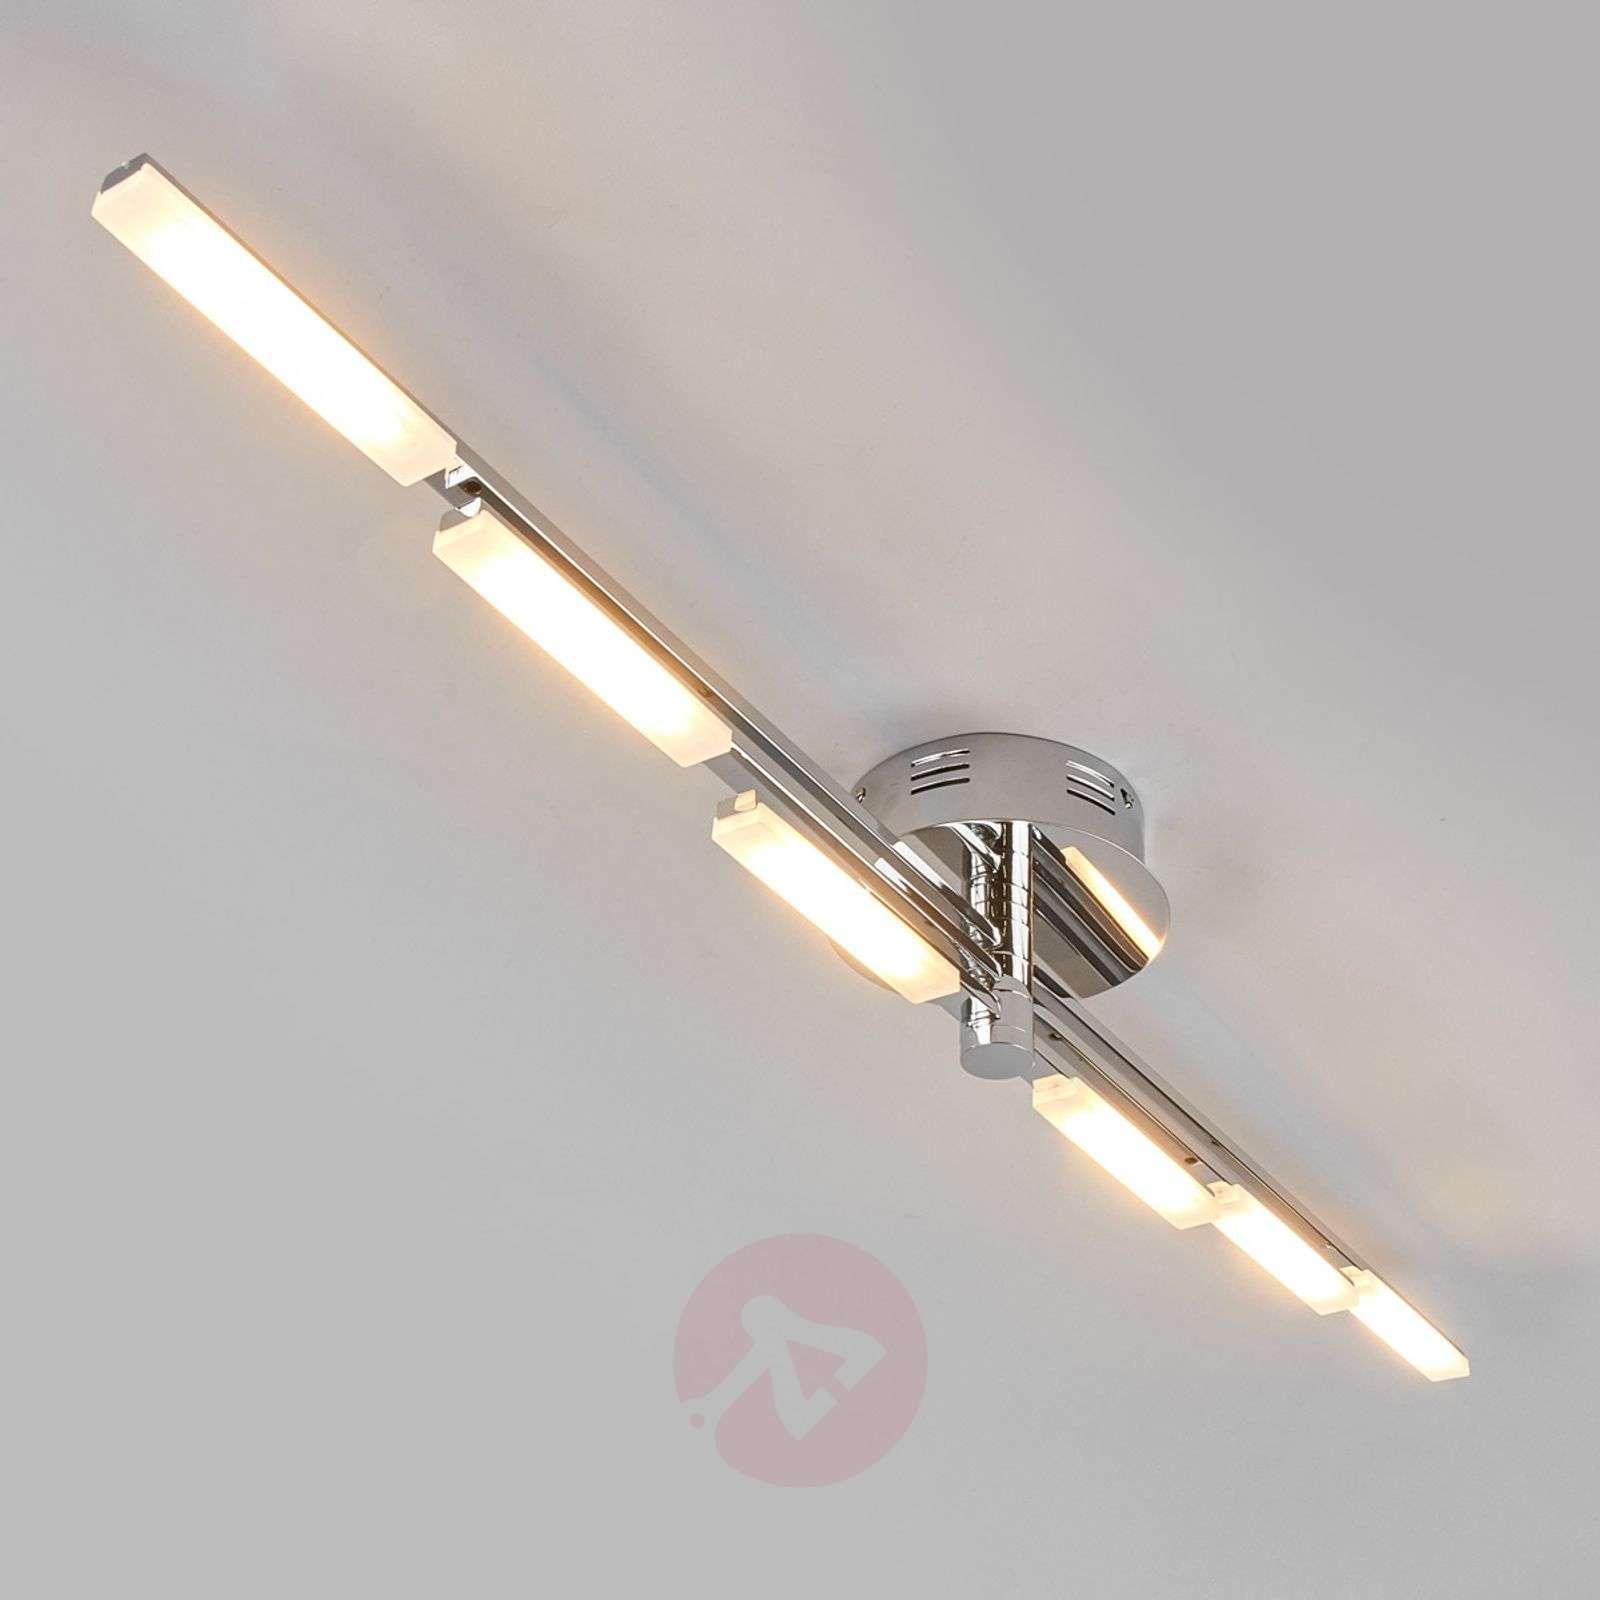 Glossy chrome LED ceiling light Natalia-9640053-01